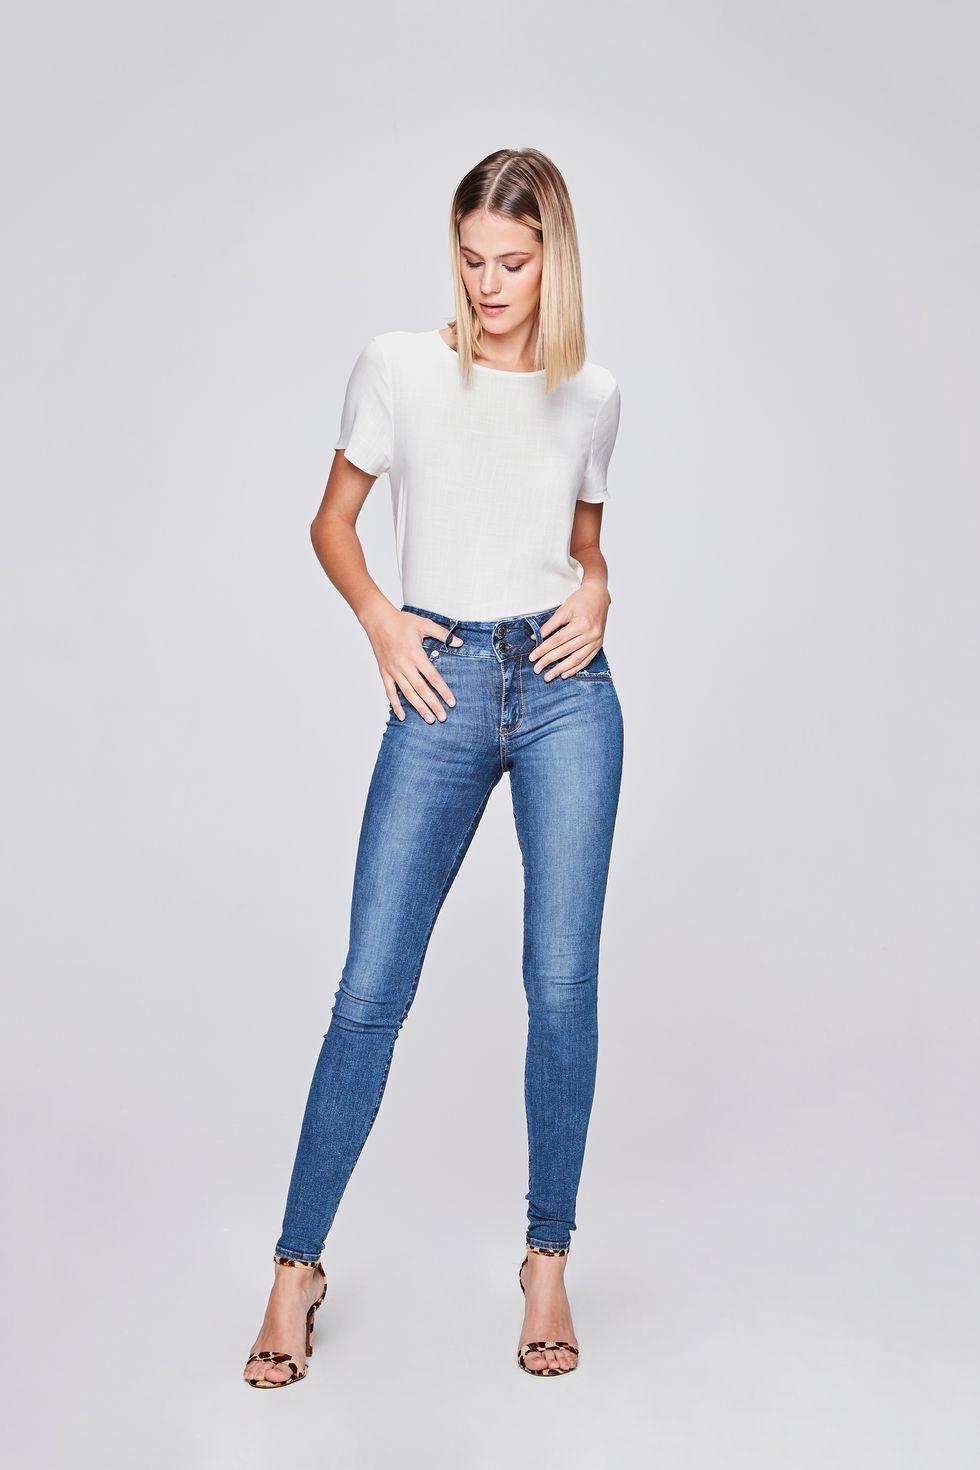 Calca-Jeans-Jegging-de-Cintura-Alta-Frente--